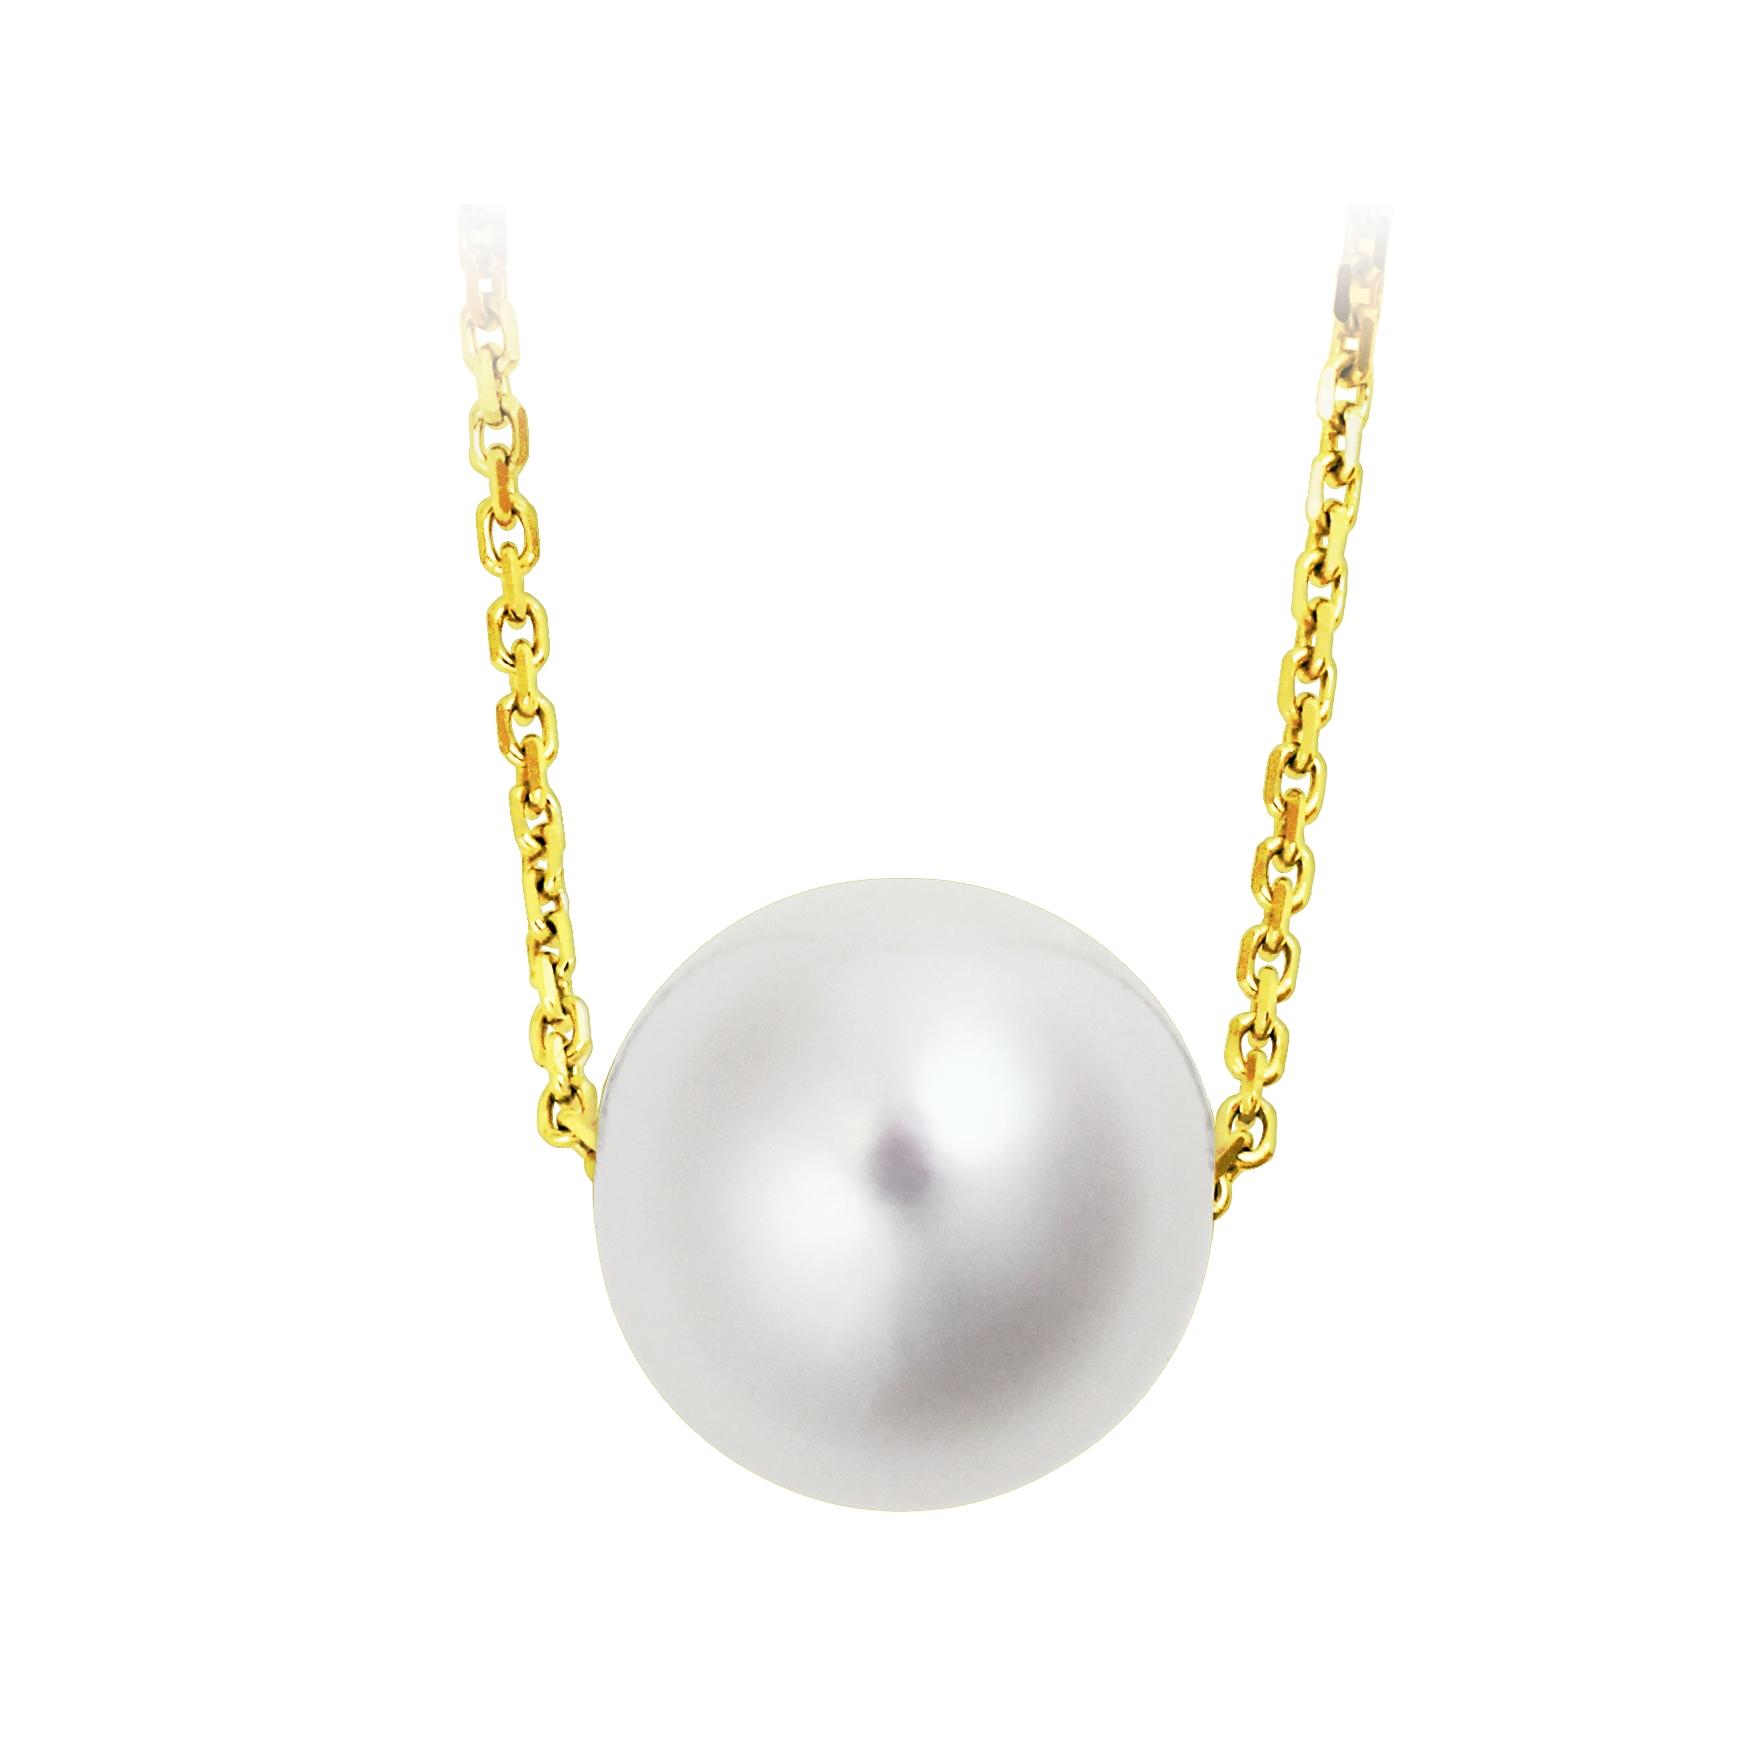 7mm珍珠項鍊